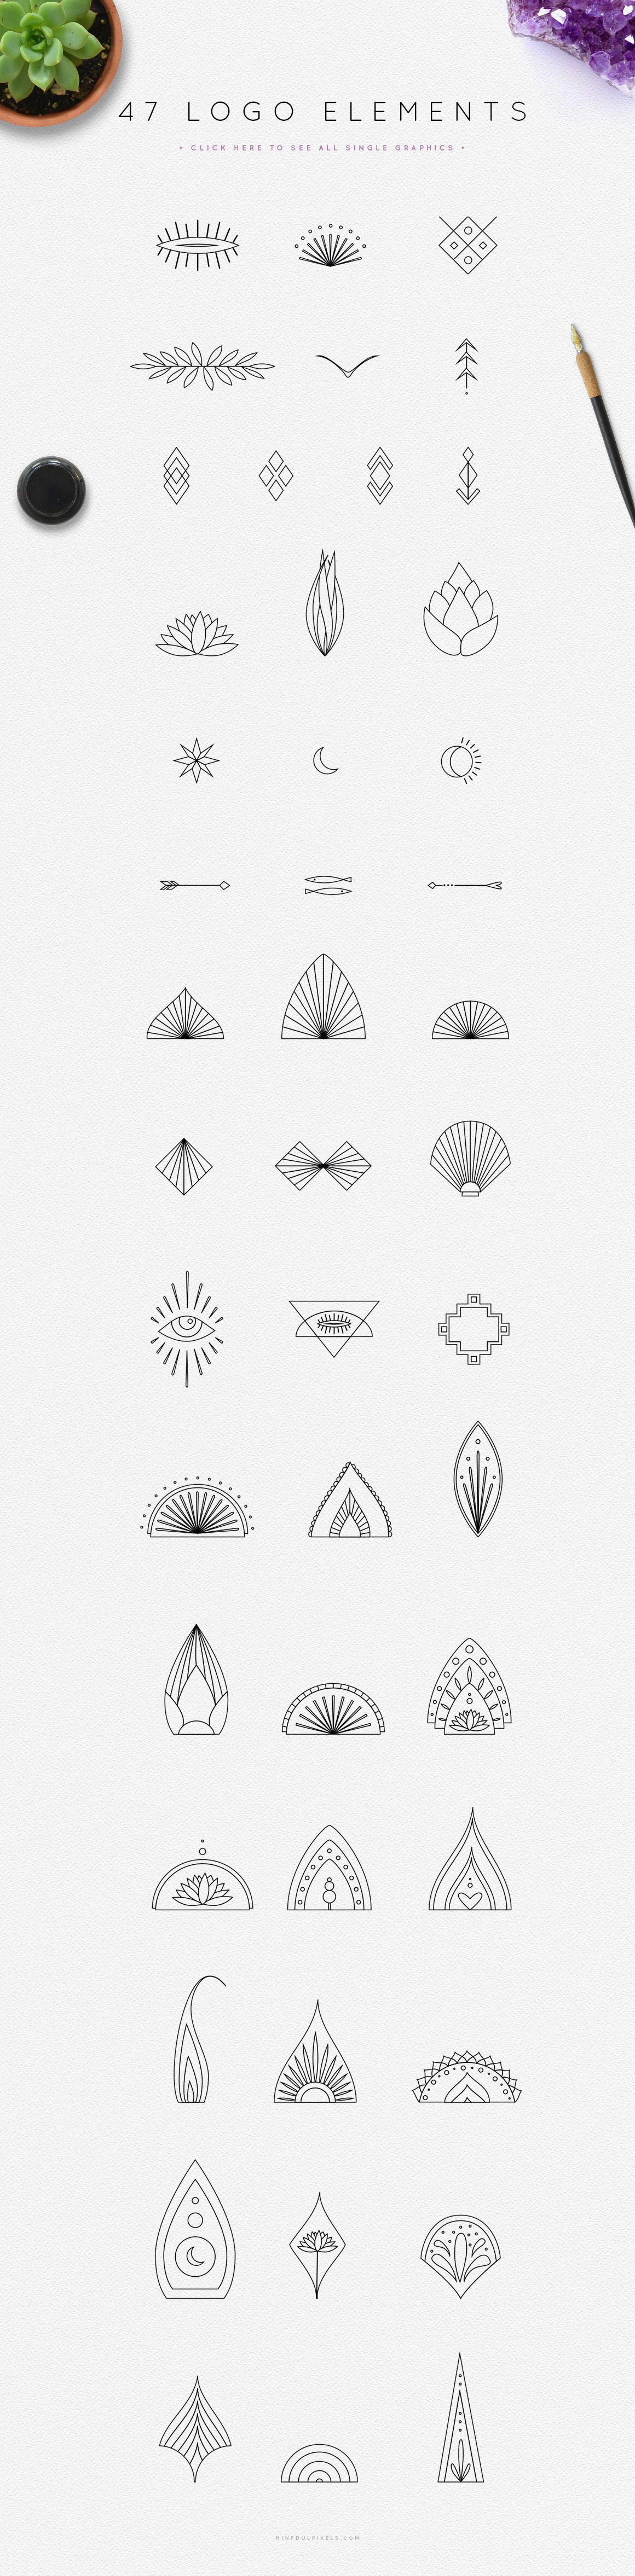 Mandala Logo Creator: Get this logo template design for your next branding project!